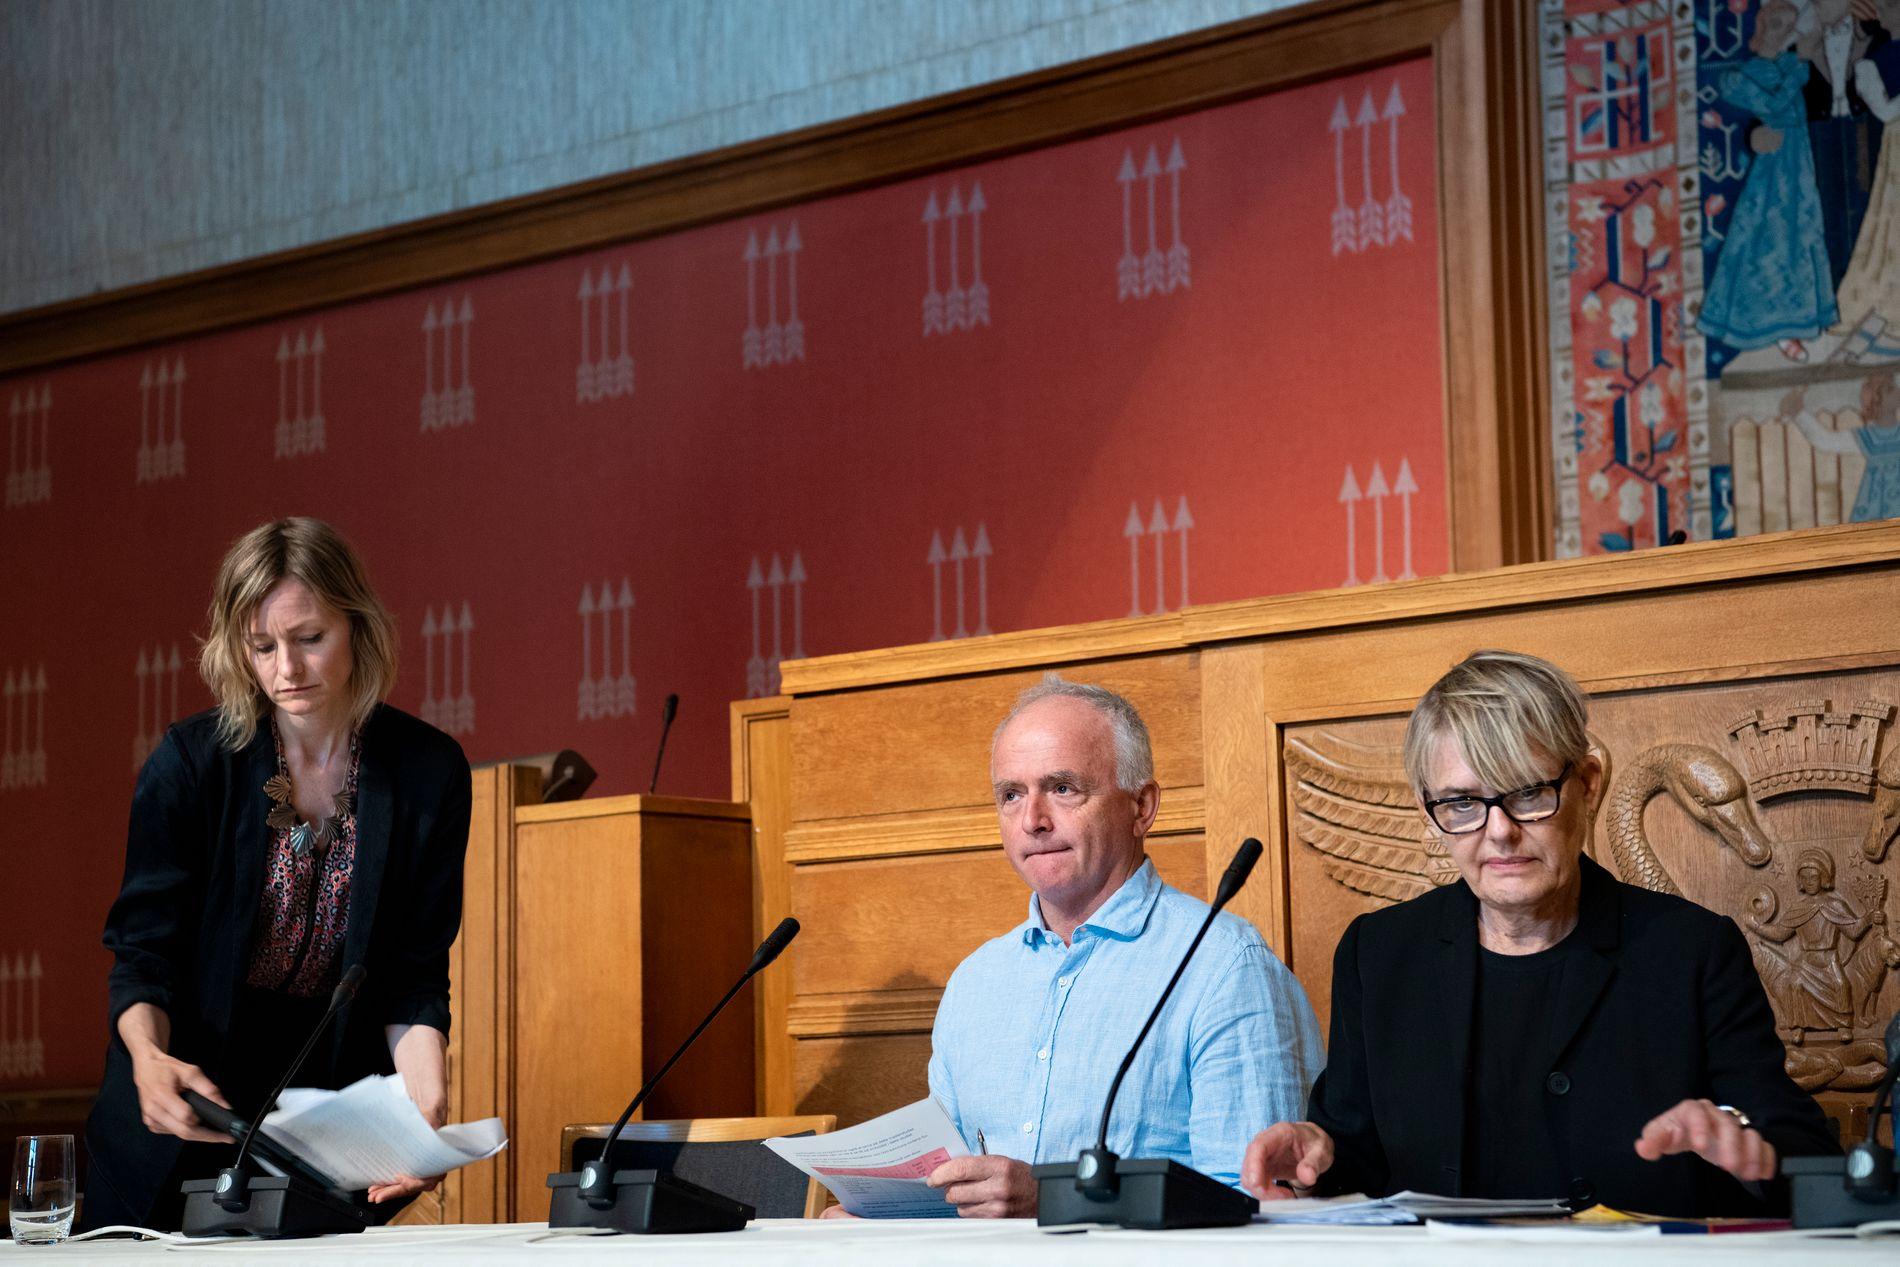 SKOLE-TRIO: Skolebyråd Inga Marte Thorkildsen, hovedverneombud i Utdanningsetaten Einar Osnes og Utdanningsdirektør Astrid Søgnen.